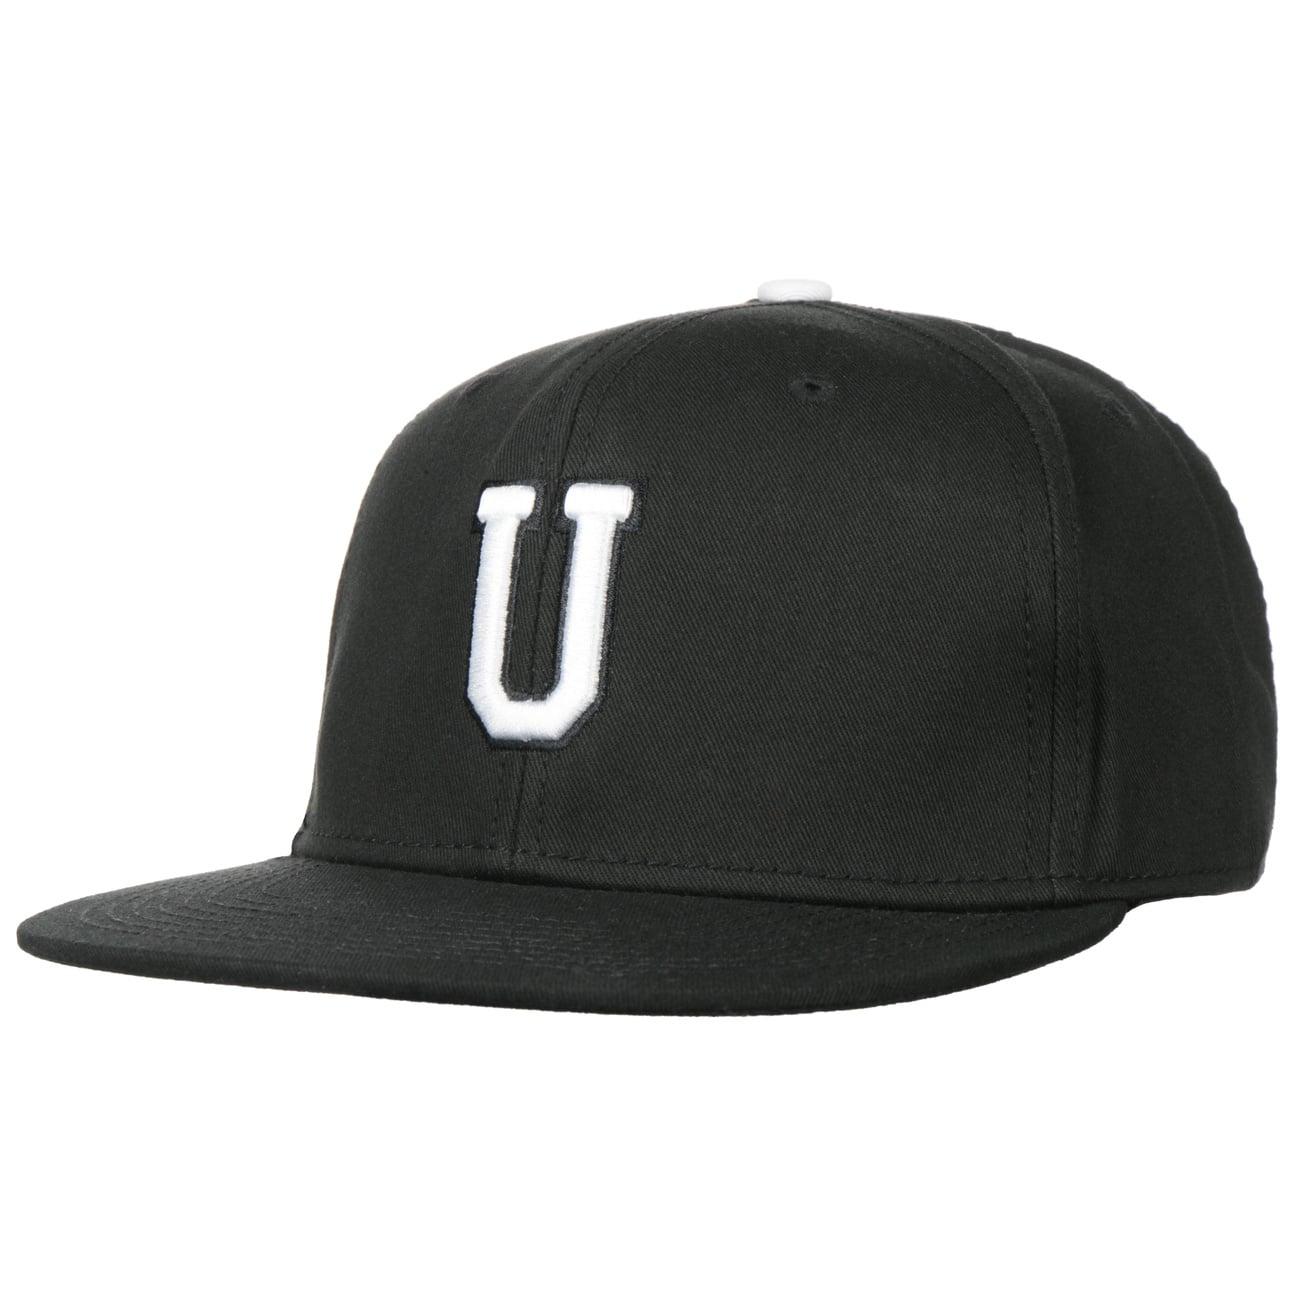 Casquette U Letter Snapback Cap  casquette de baseball